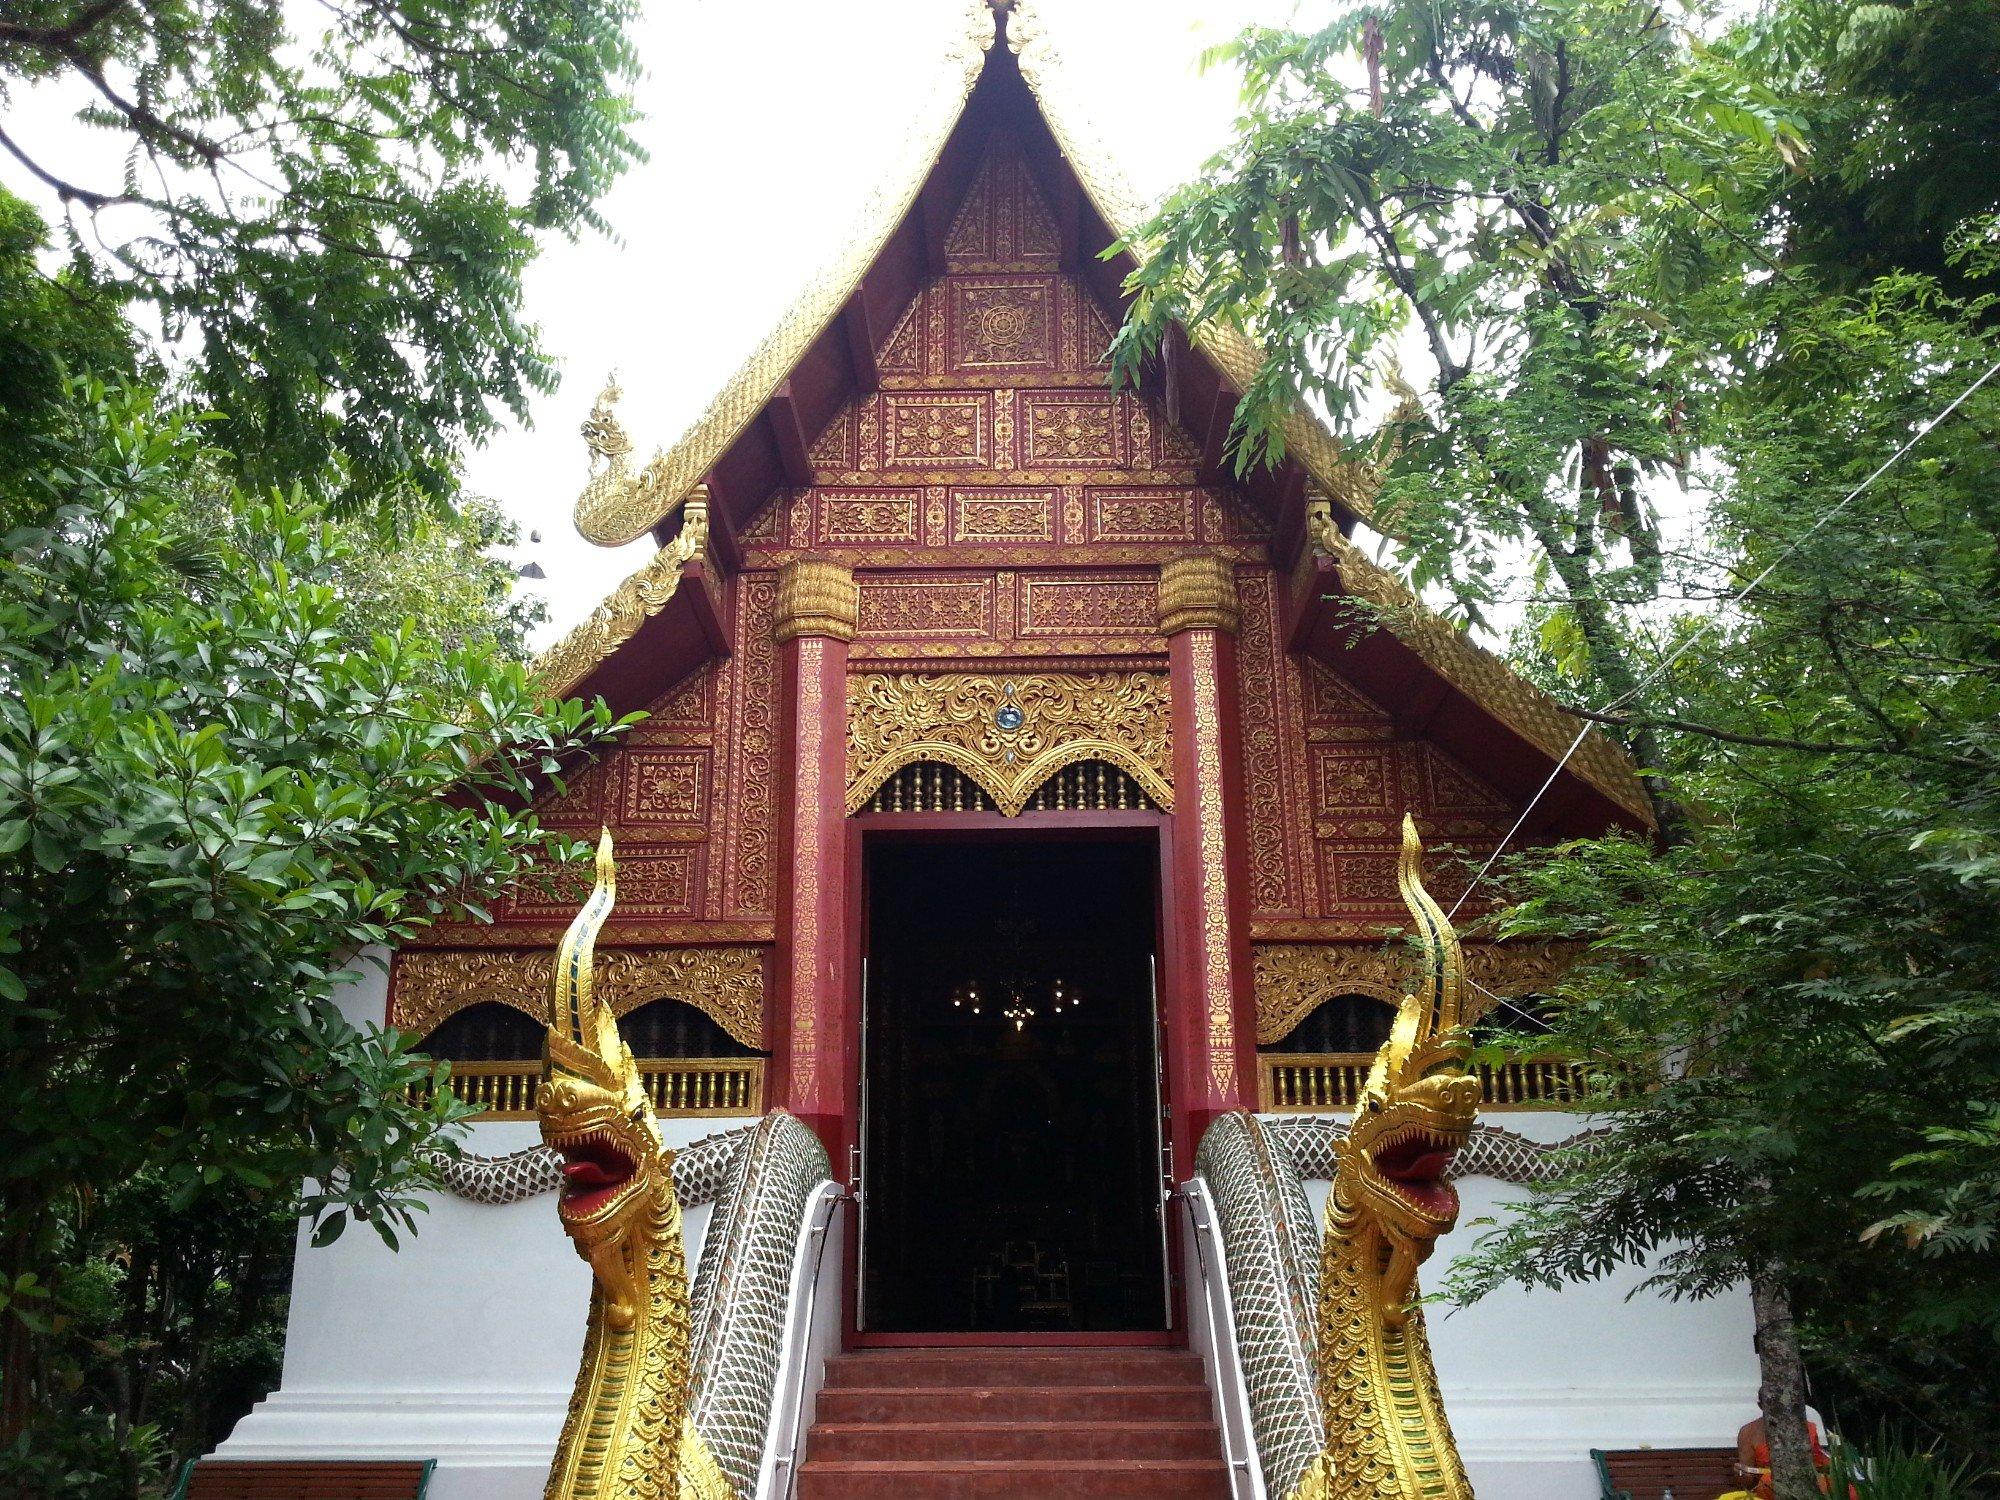 Ordination hall at Wat Phra Kaew